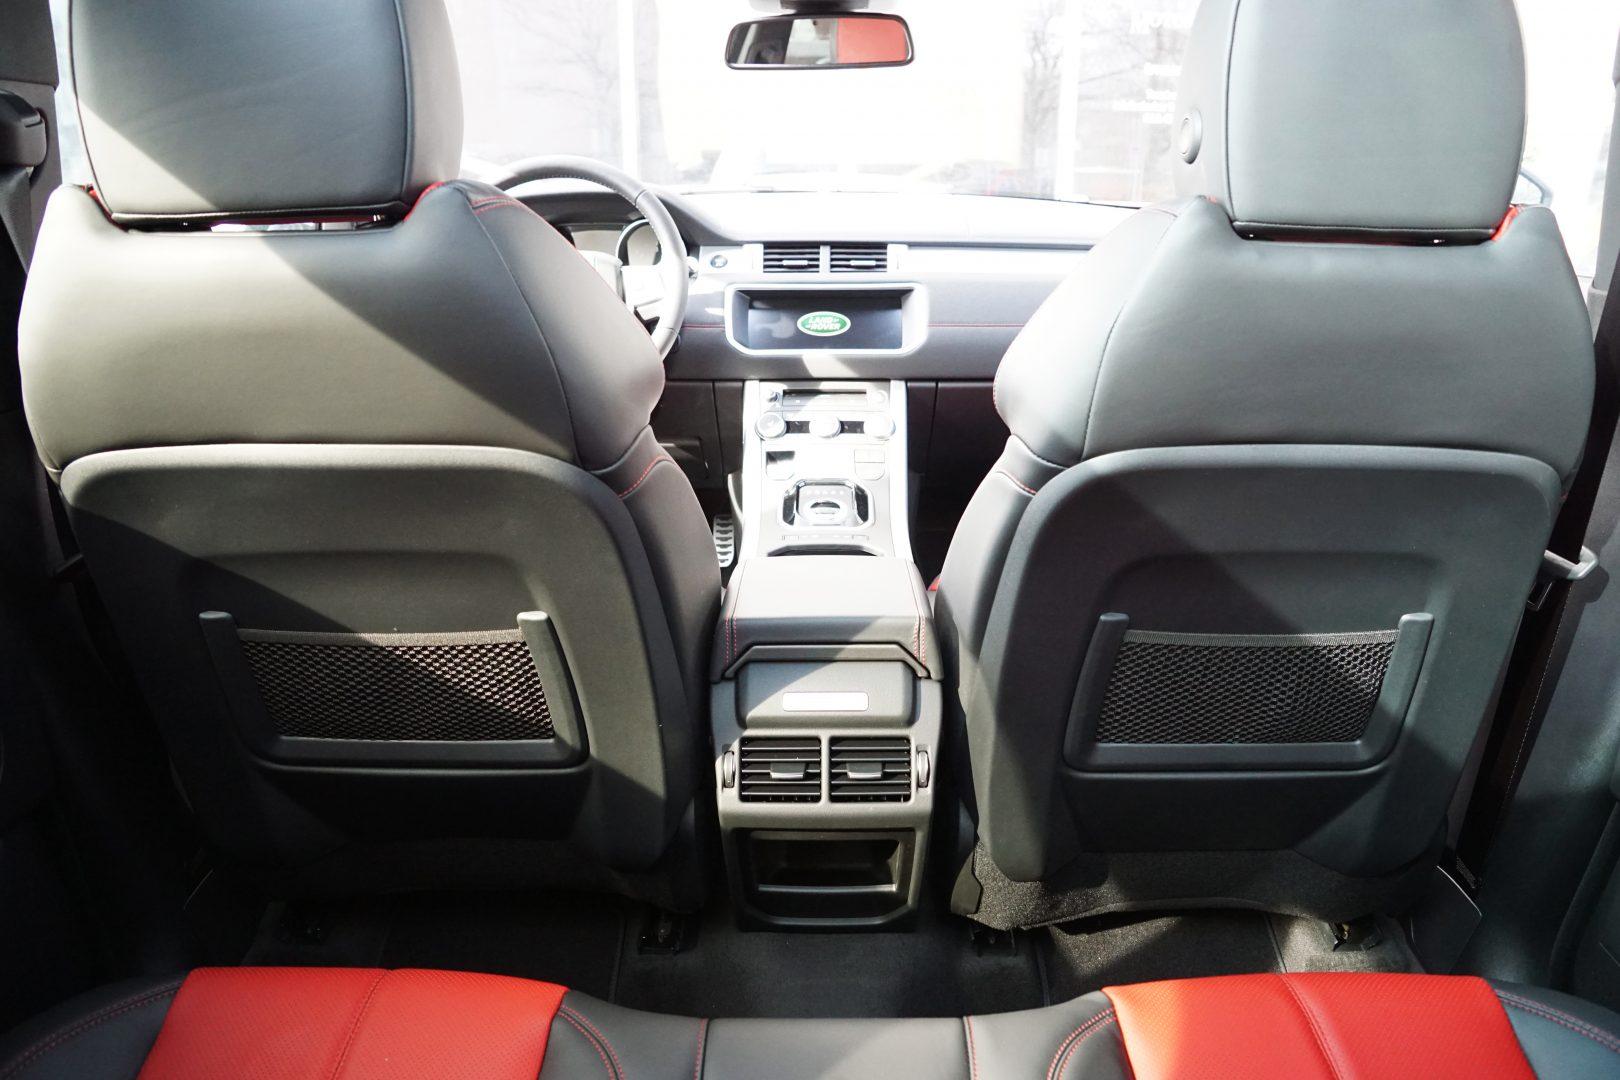 AIL Land Rover Range Rover Evoque HSE Dynamic 2.0 TD4  7